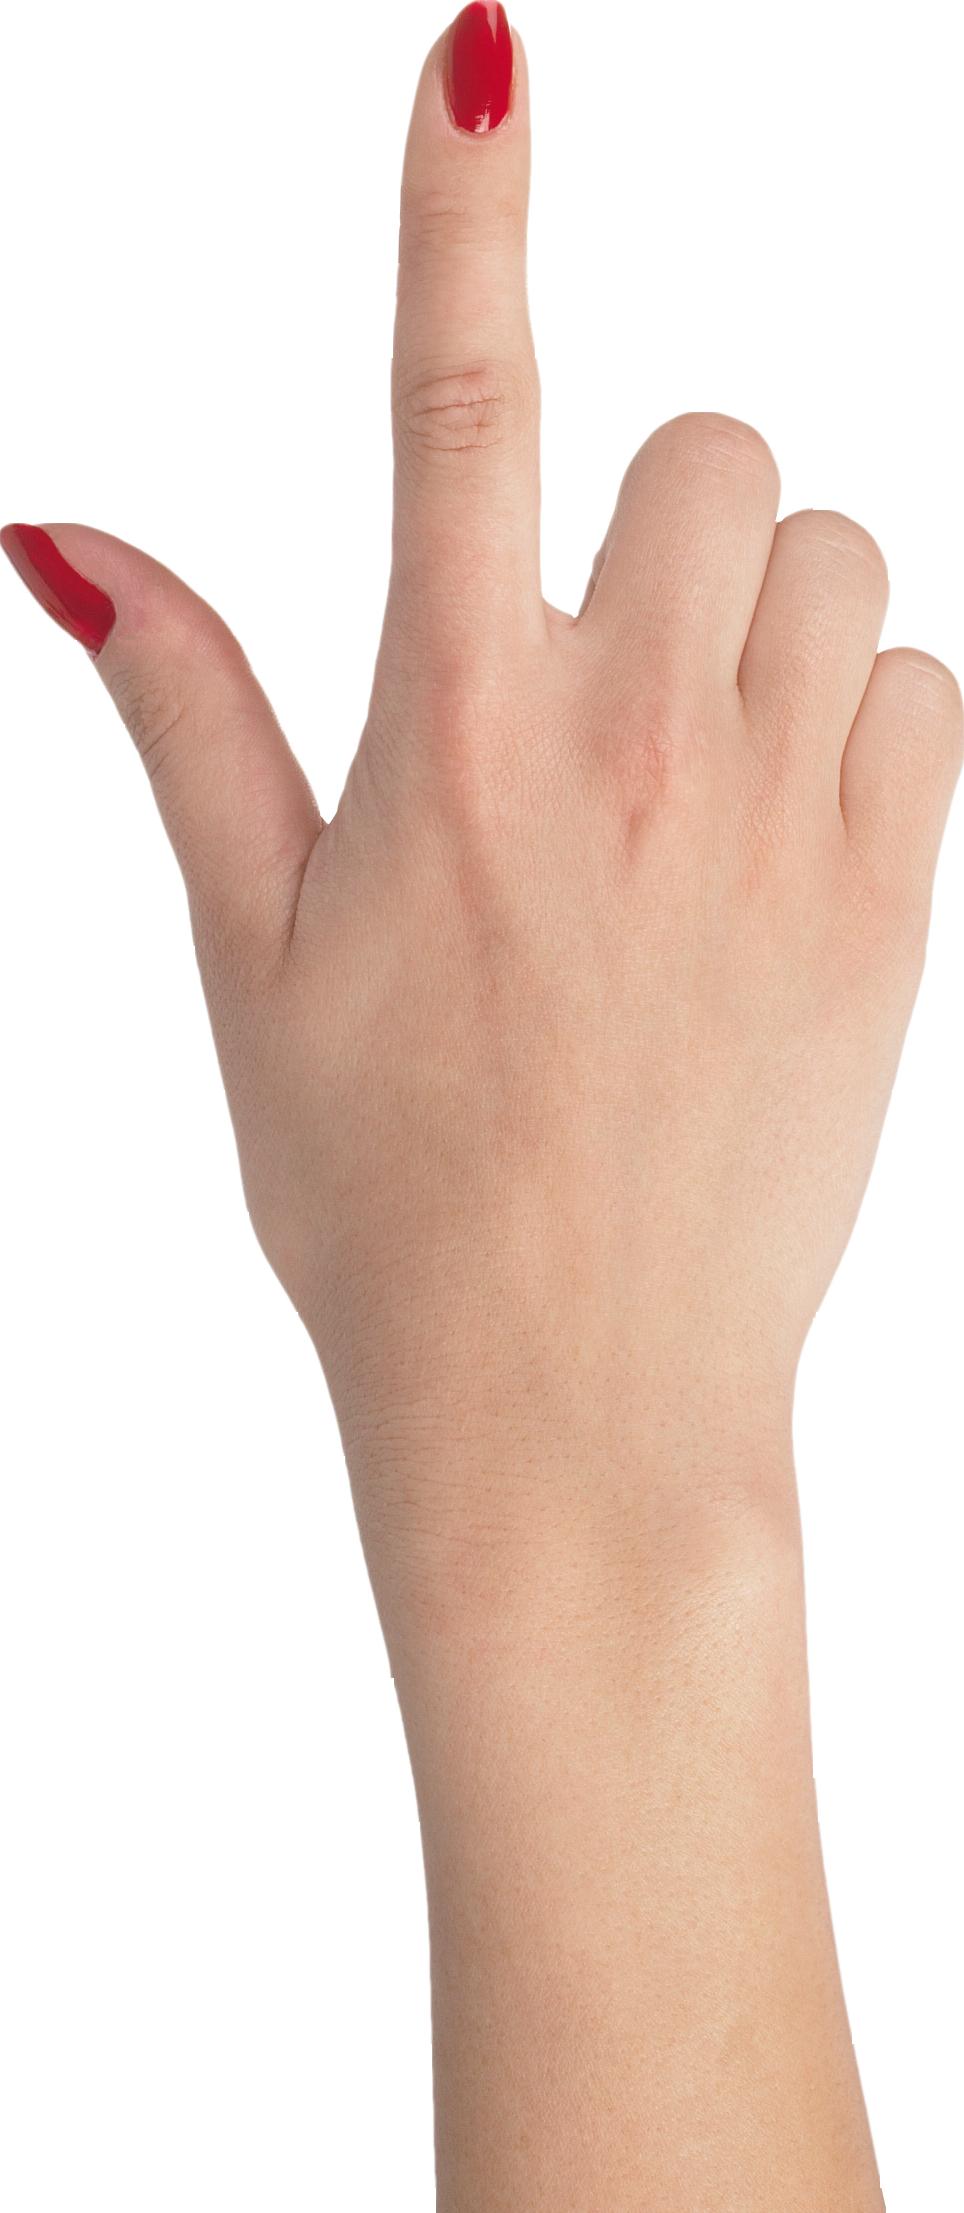 Hands - Fingers PNG